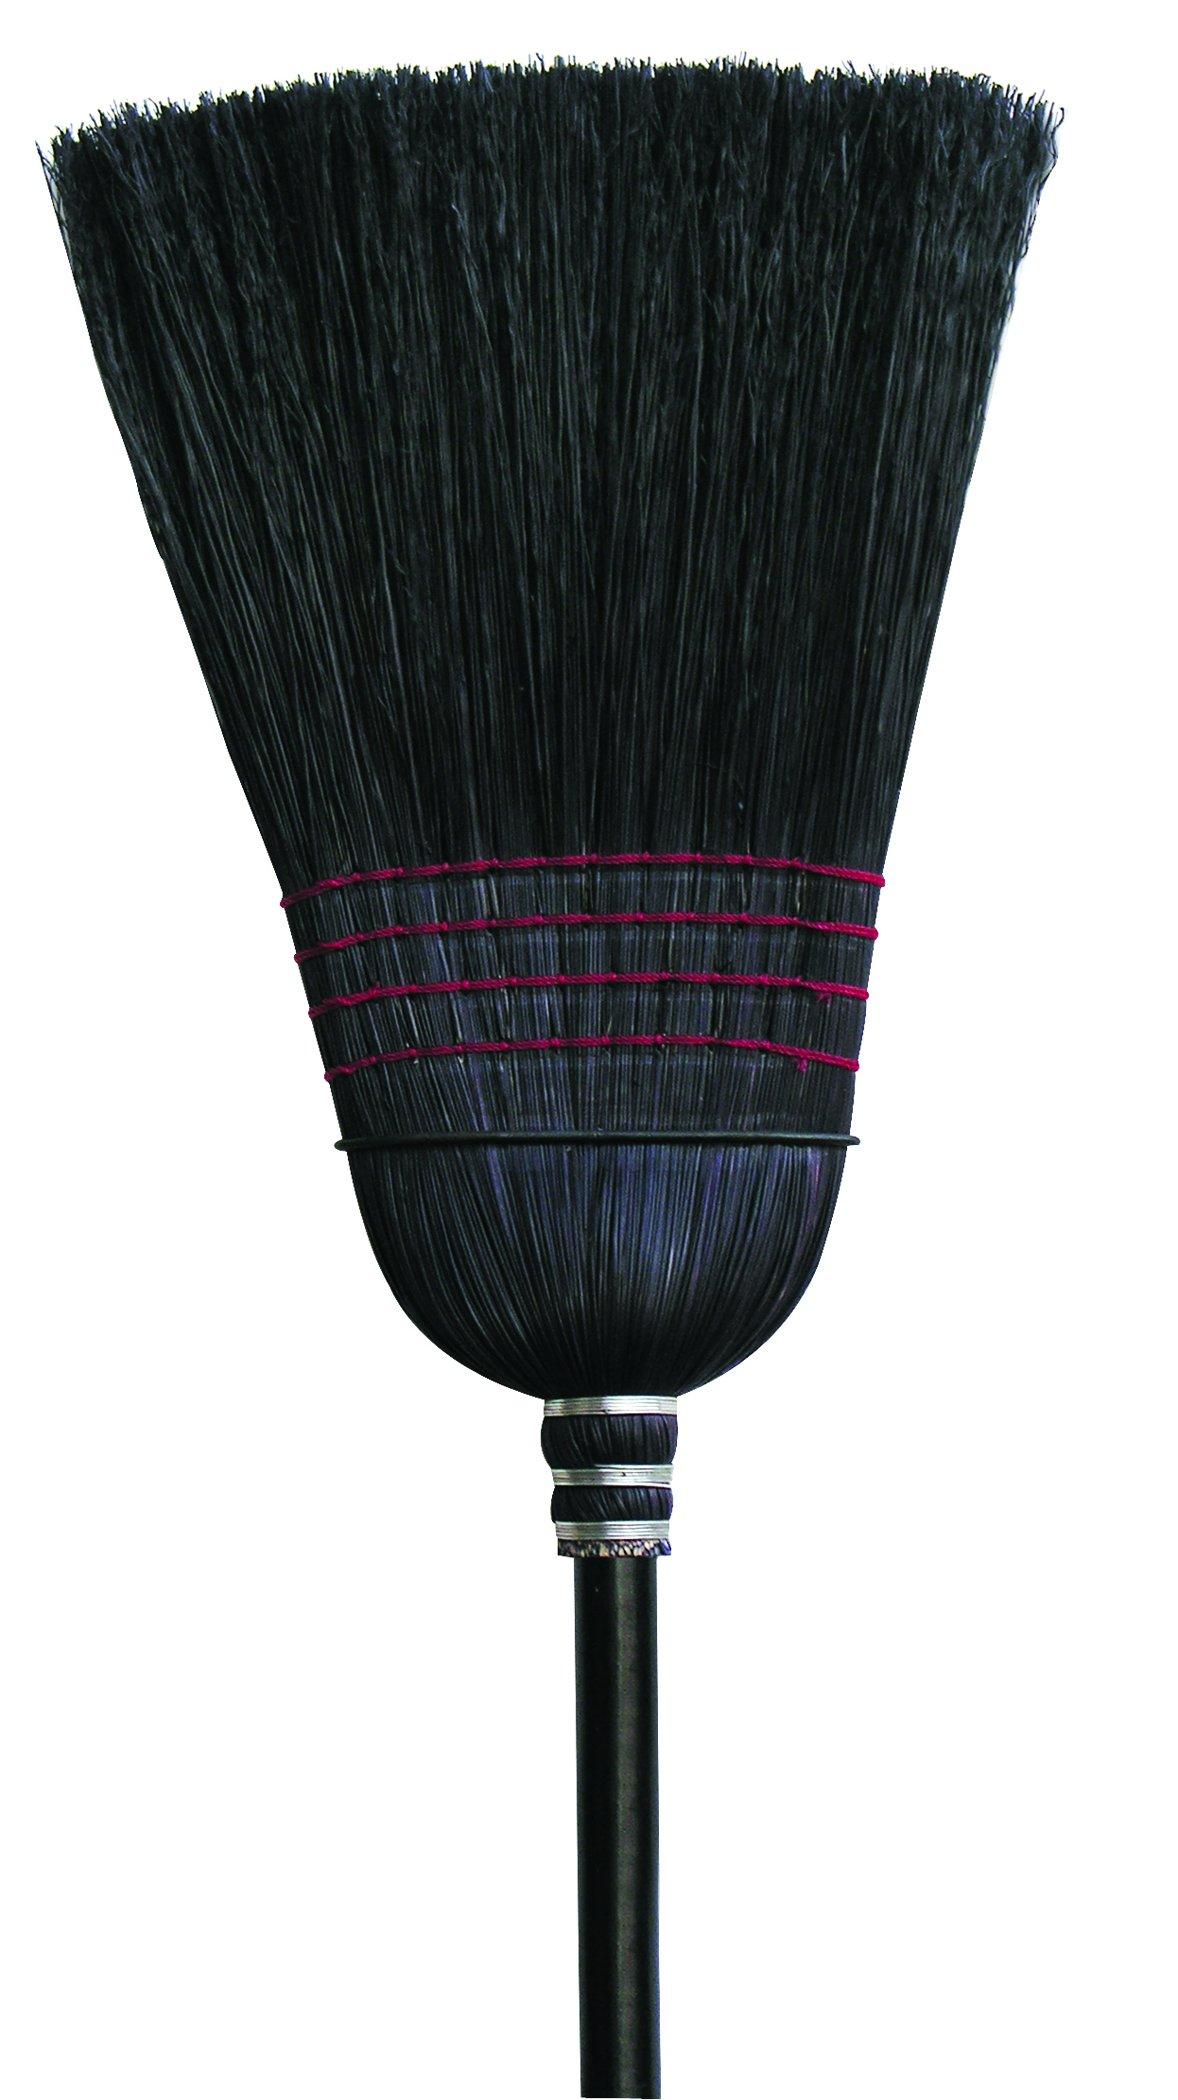 O'Cedar Commercial 6118-6 Warehouse Black Corn Broom (Pack of 6) by O-Cedar Commercial